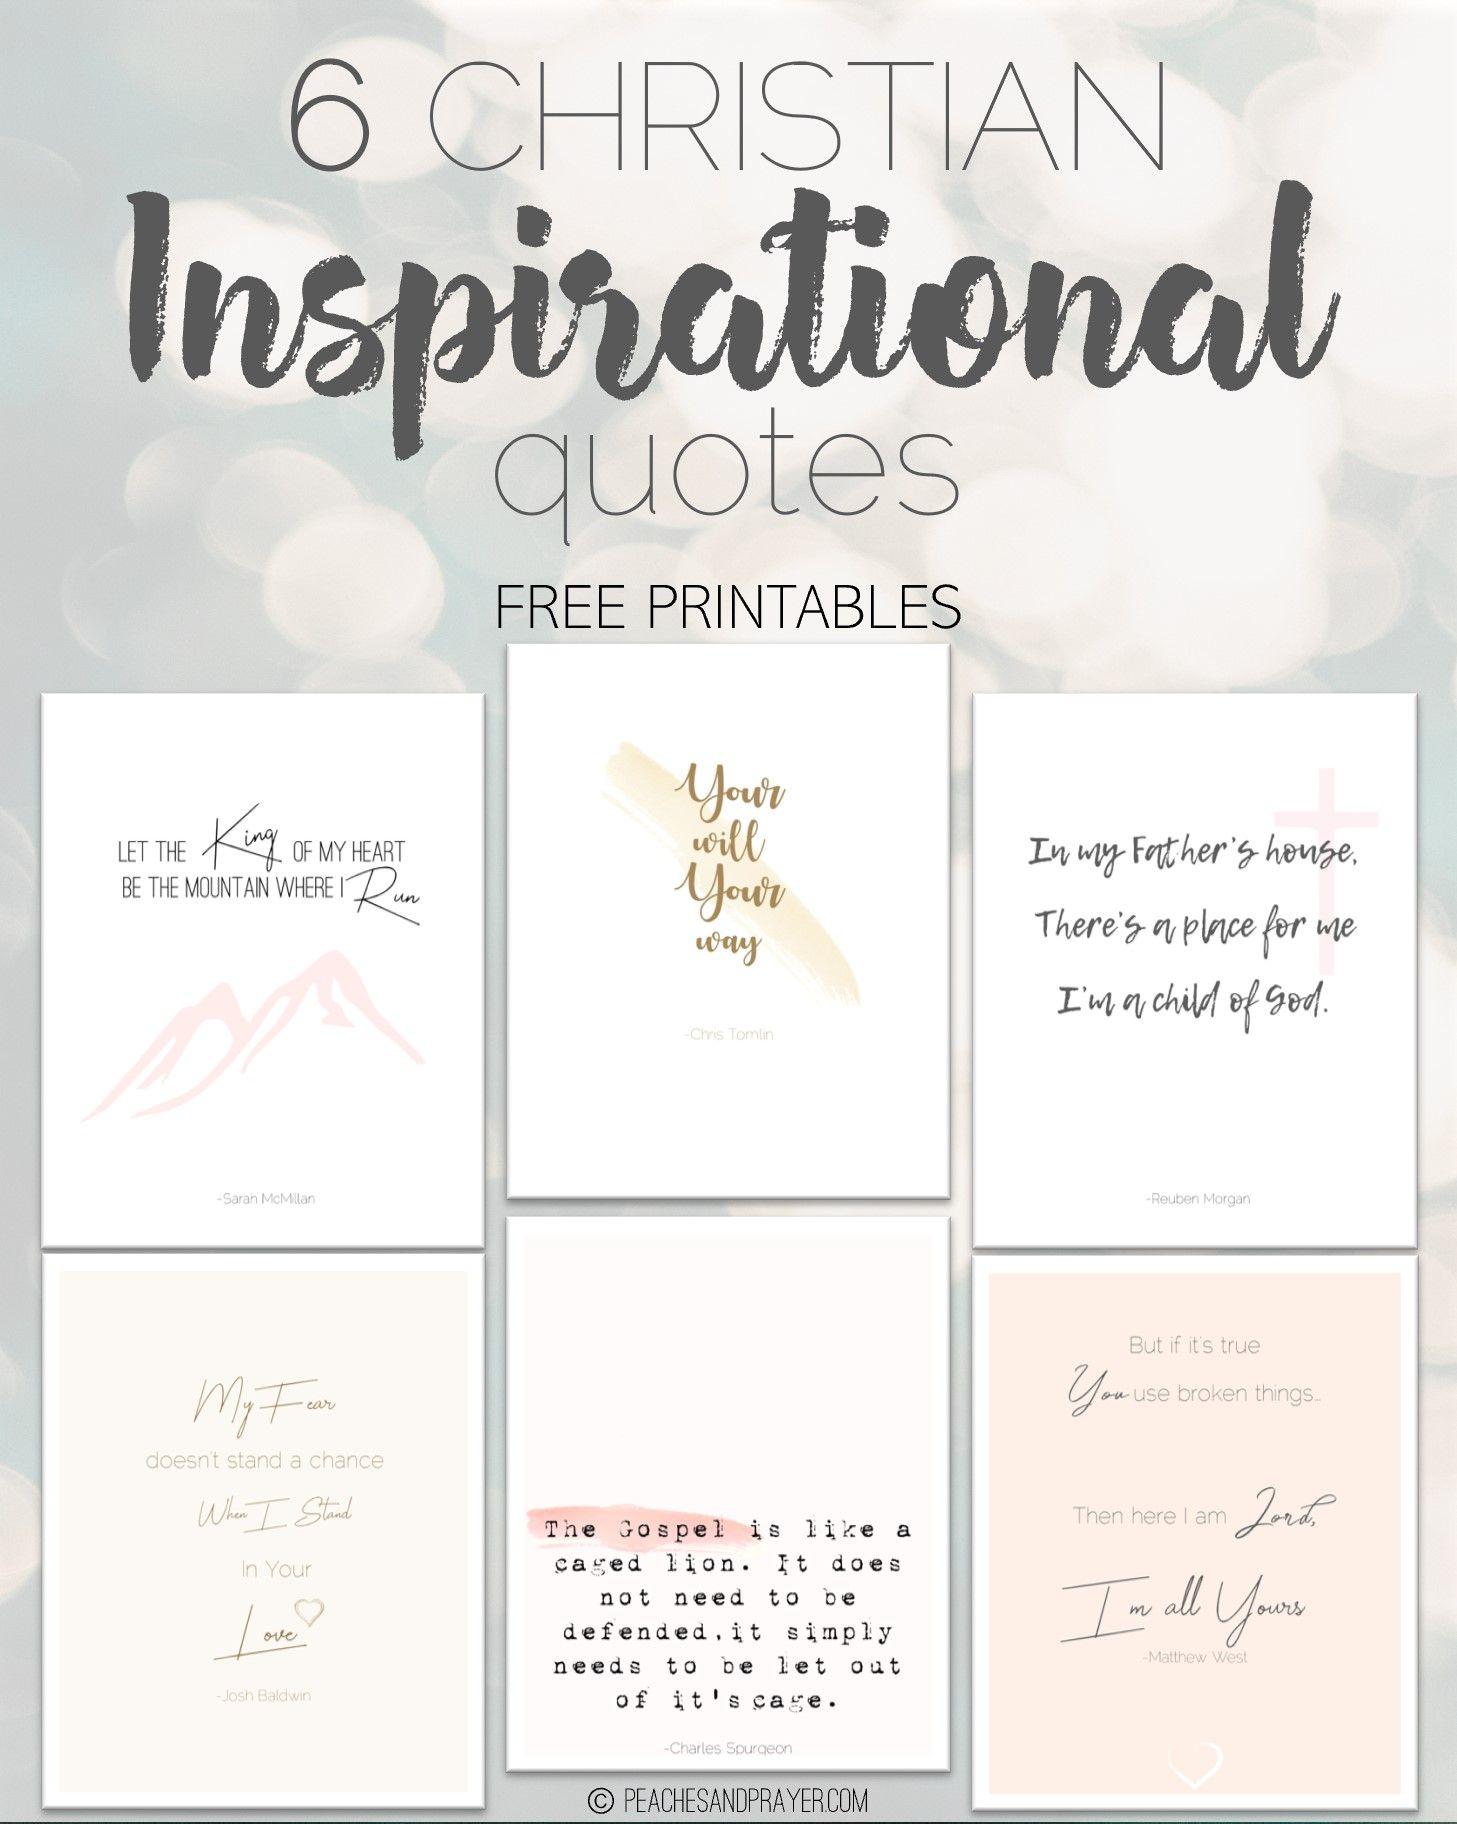 Christian Inspirational Quotes Christian Quotes Inspirational Encouragement Quotes Christian Free Christian Printables